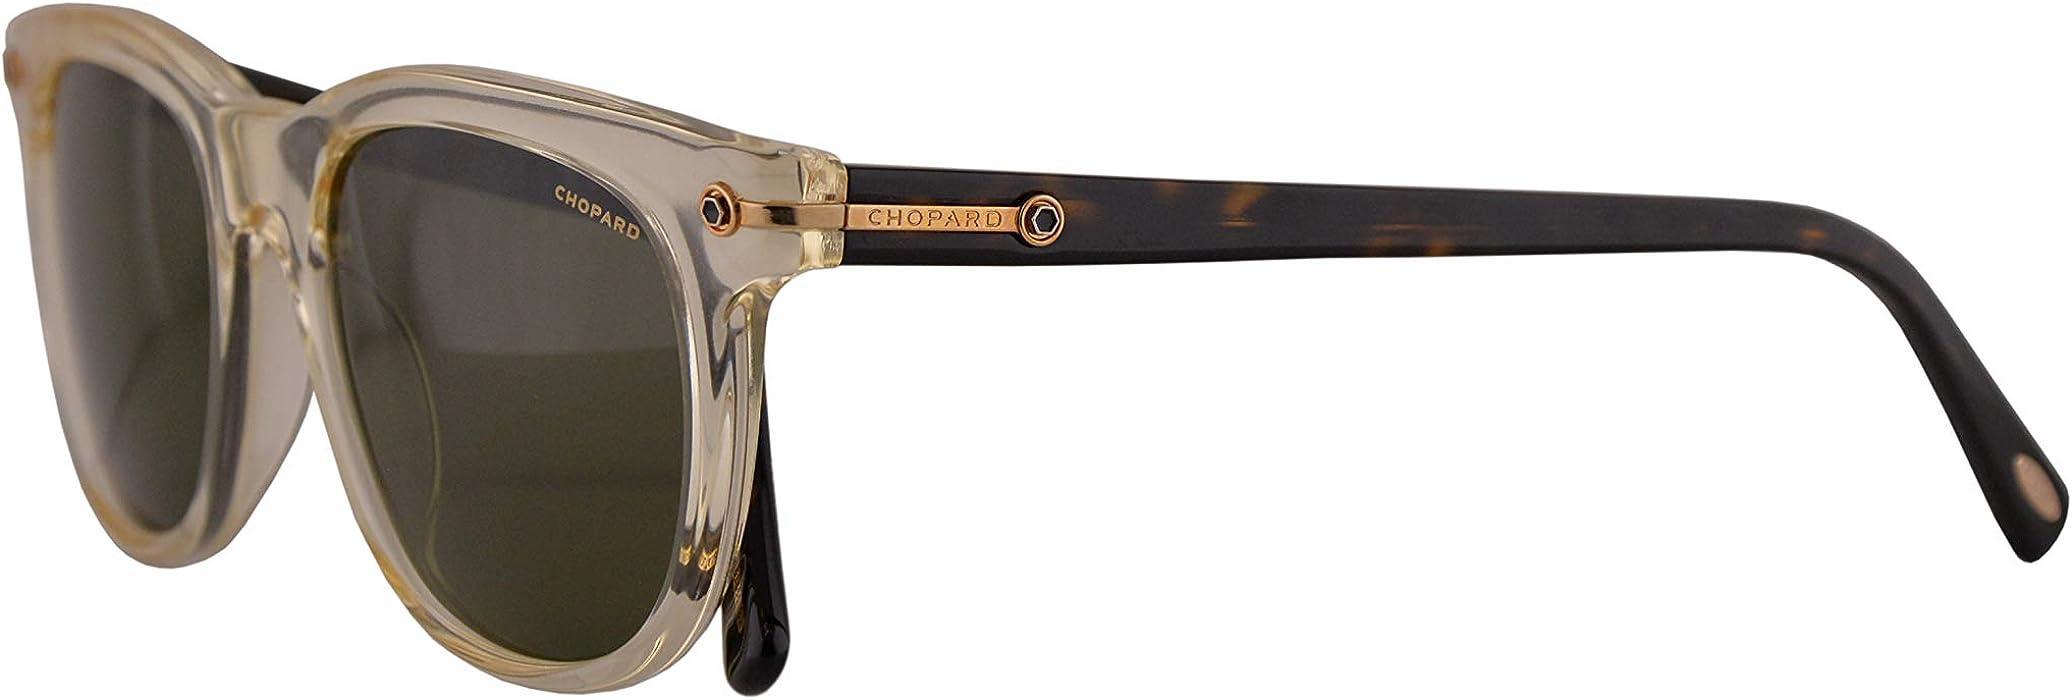 ab1a2ca617 Chopard SCH192 Sunglasses Crystal Yellow w Polarized Green Lens 52mm 846P  SCH 192